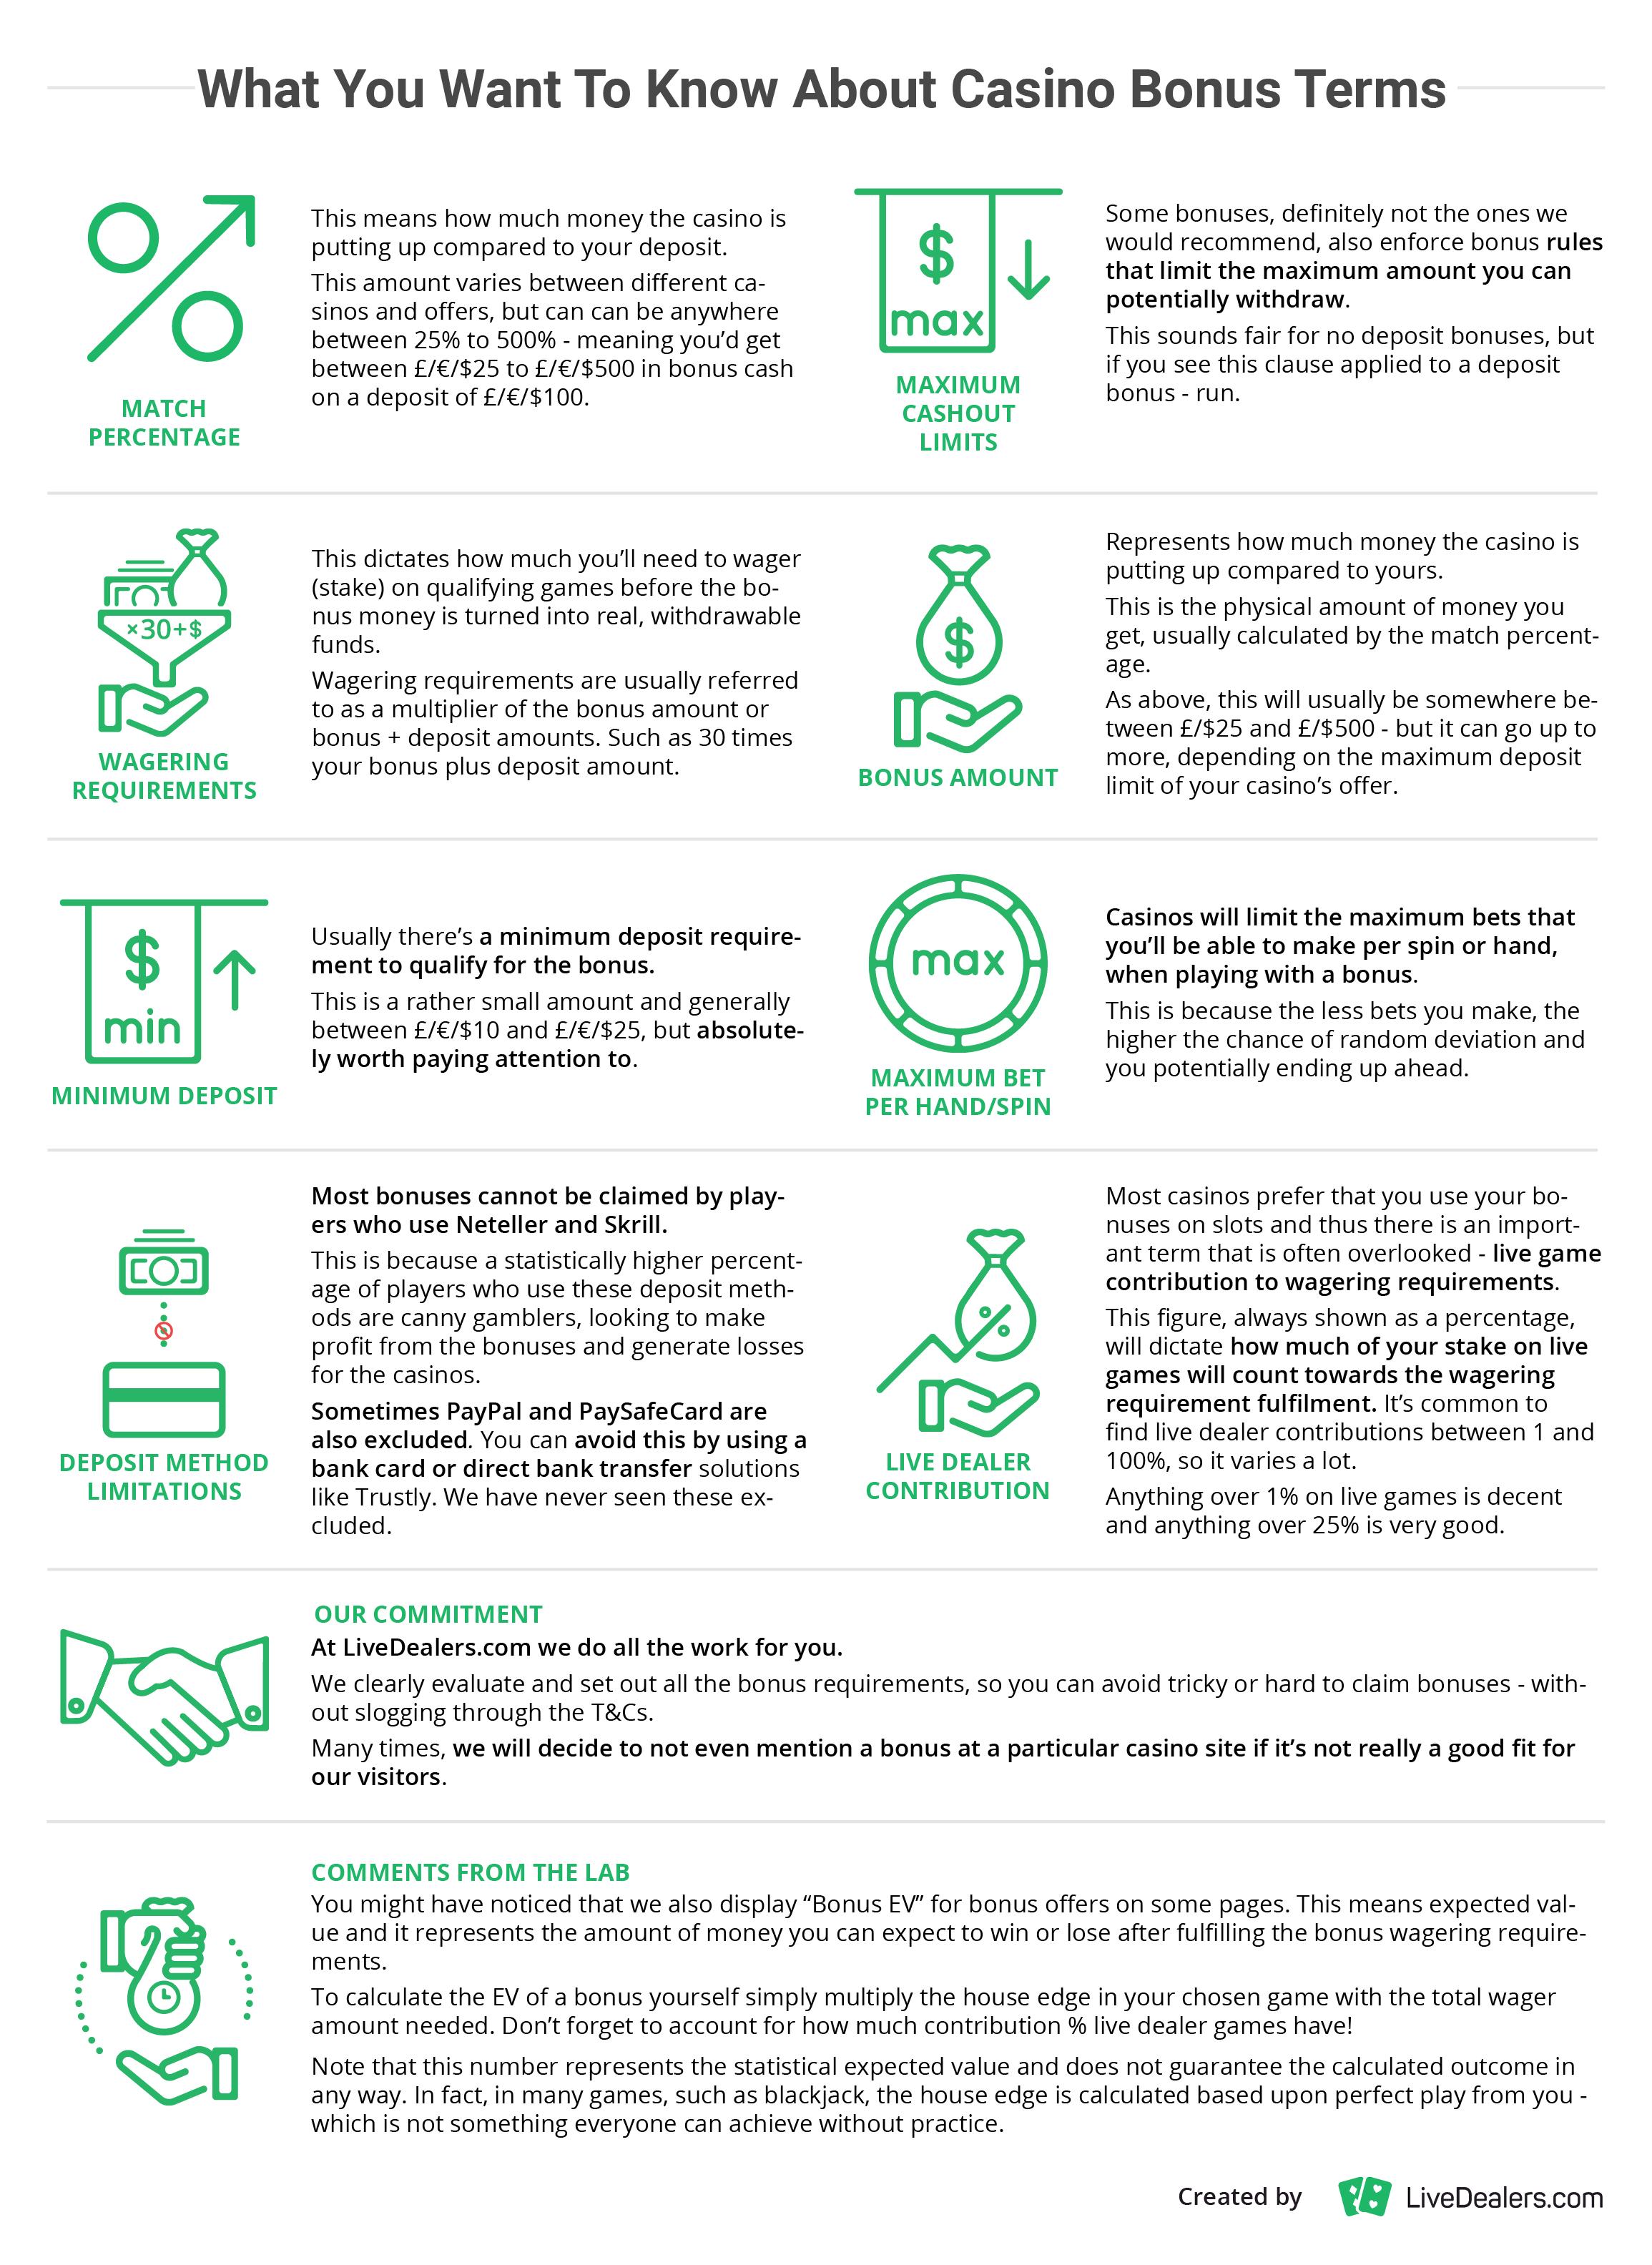 great explanation on how casino bonuses work